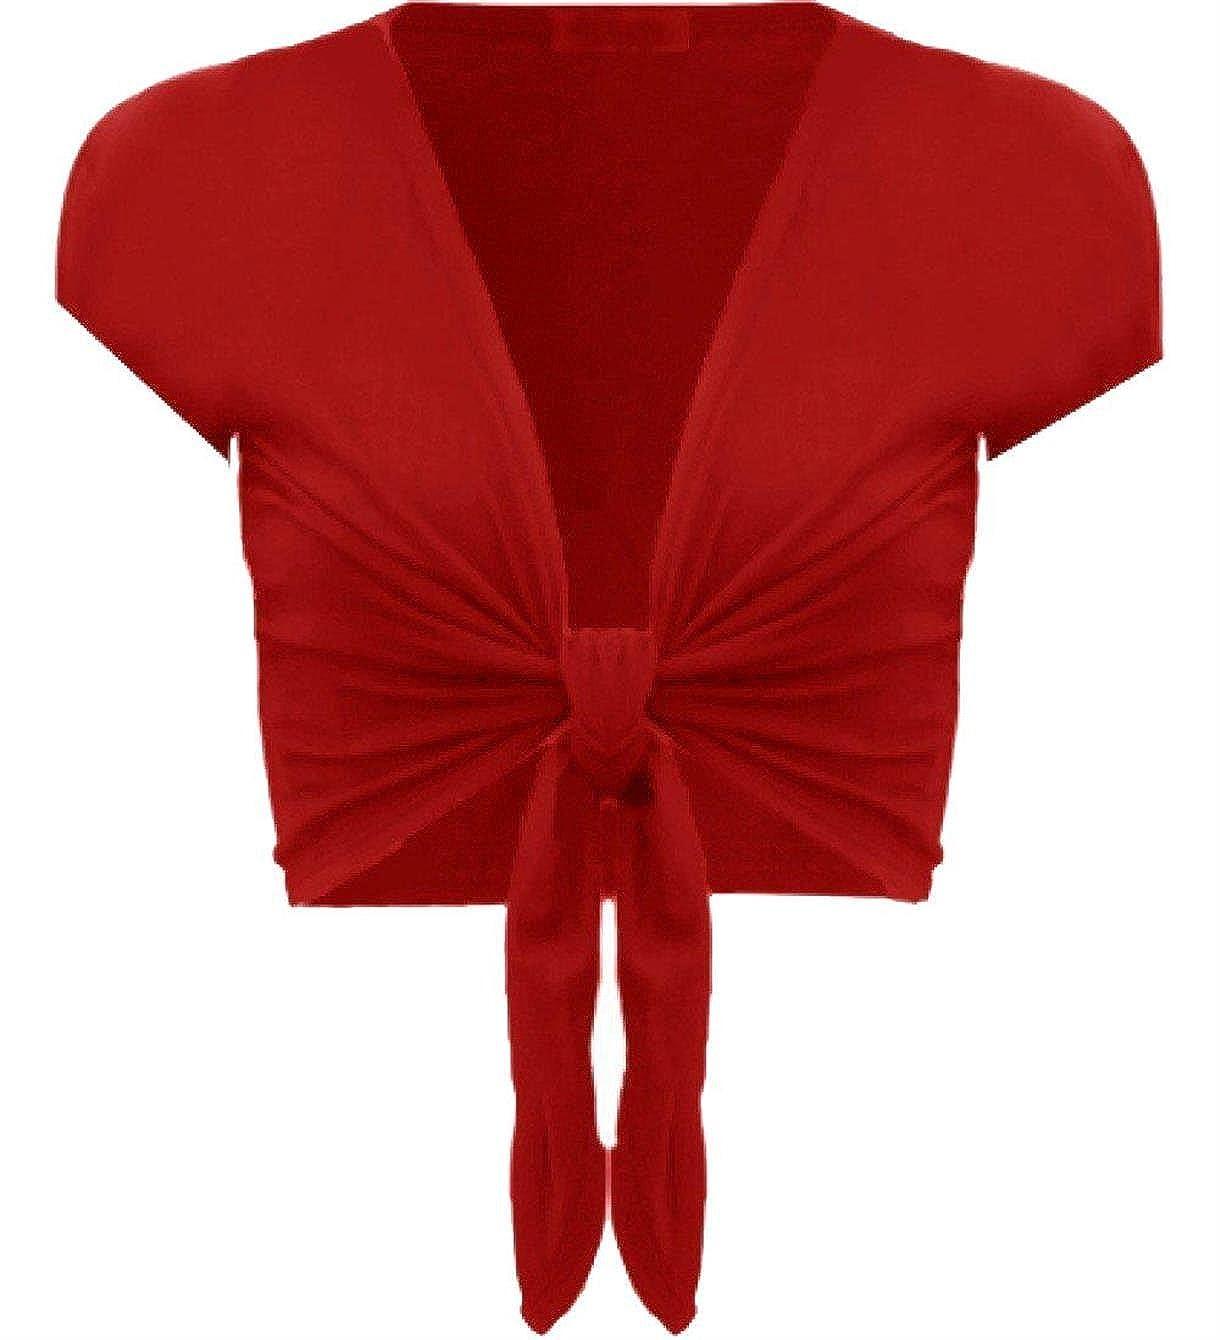 Womens Tie up Short Sleeve Bolero Shrug Club Wear Top